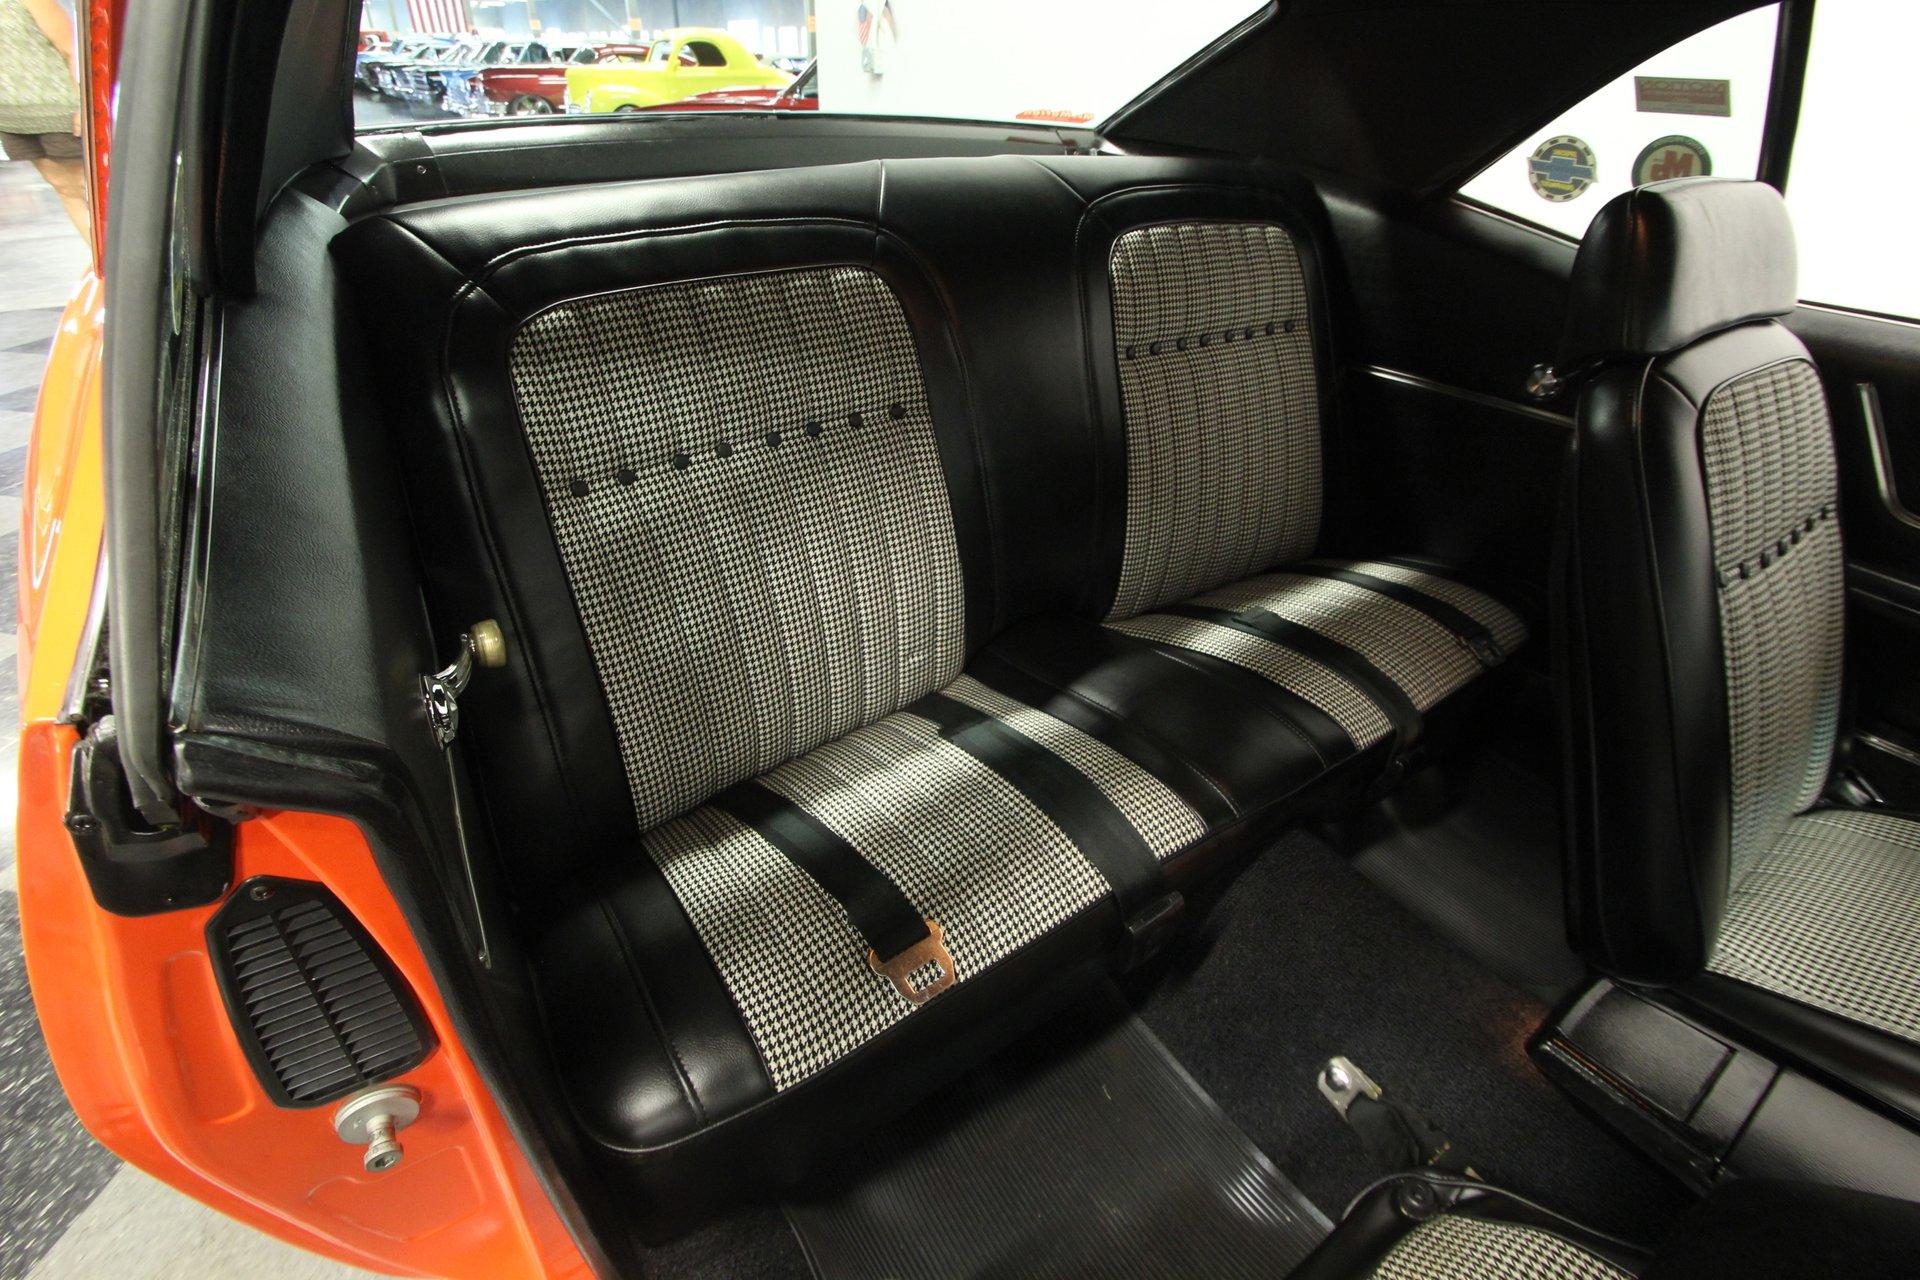 1969 Chevrolet Camaro | Streetside Classics - The Nation's